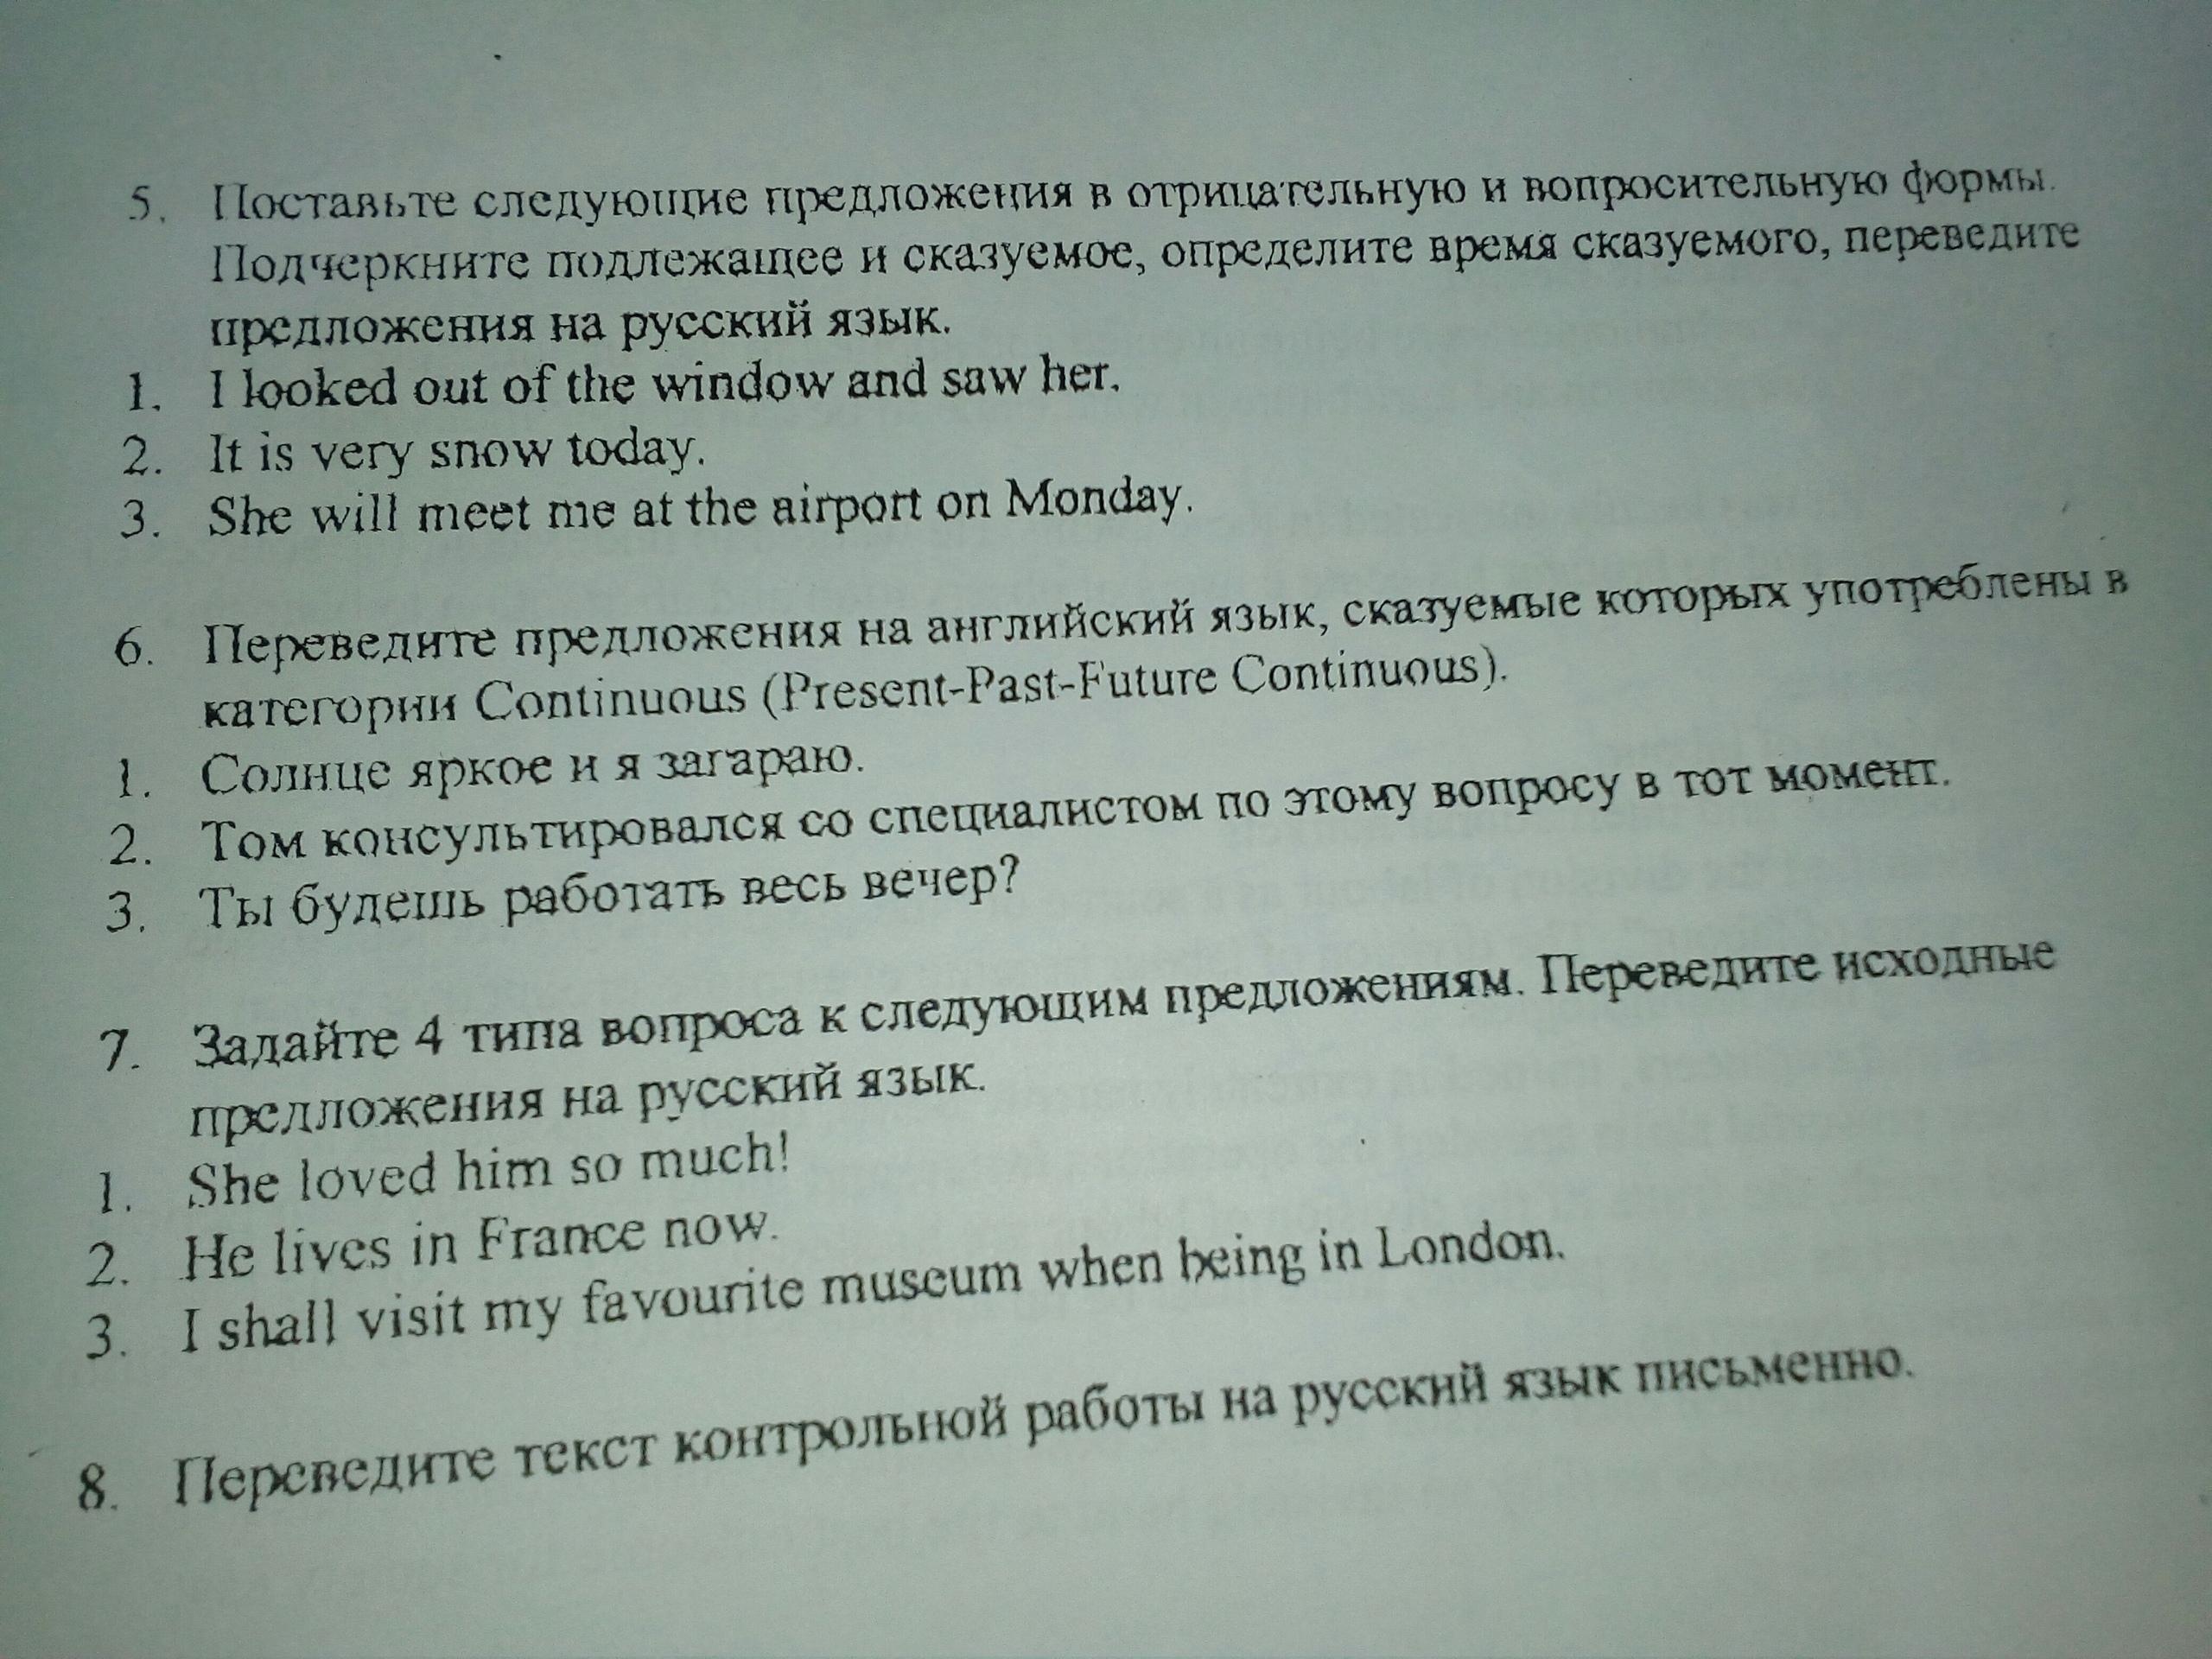 гдз по зачтным работам по русскому языку 7 класс аксенова